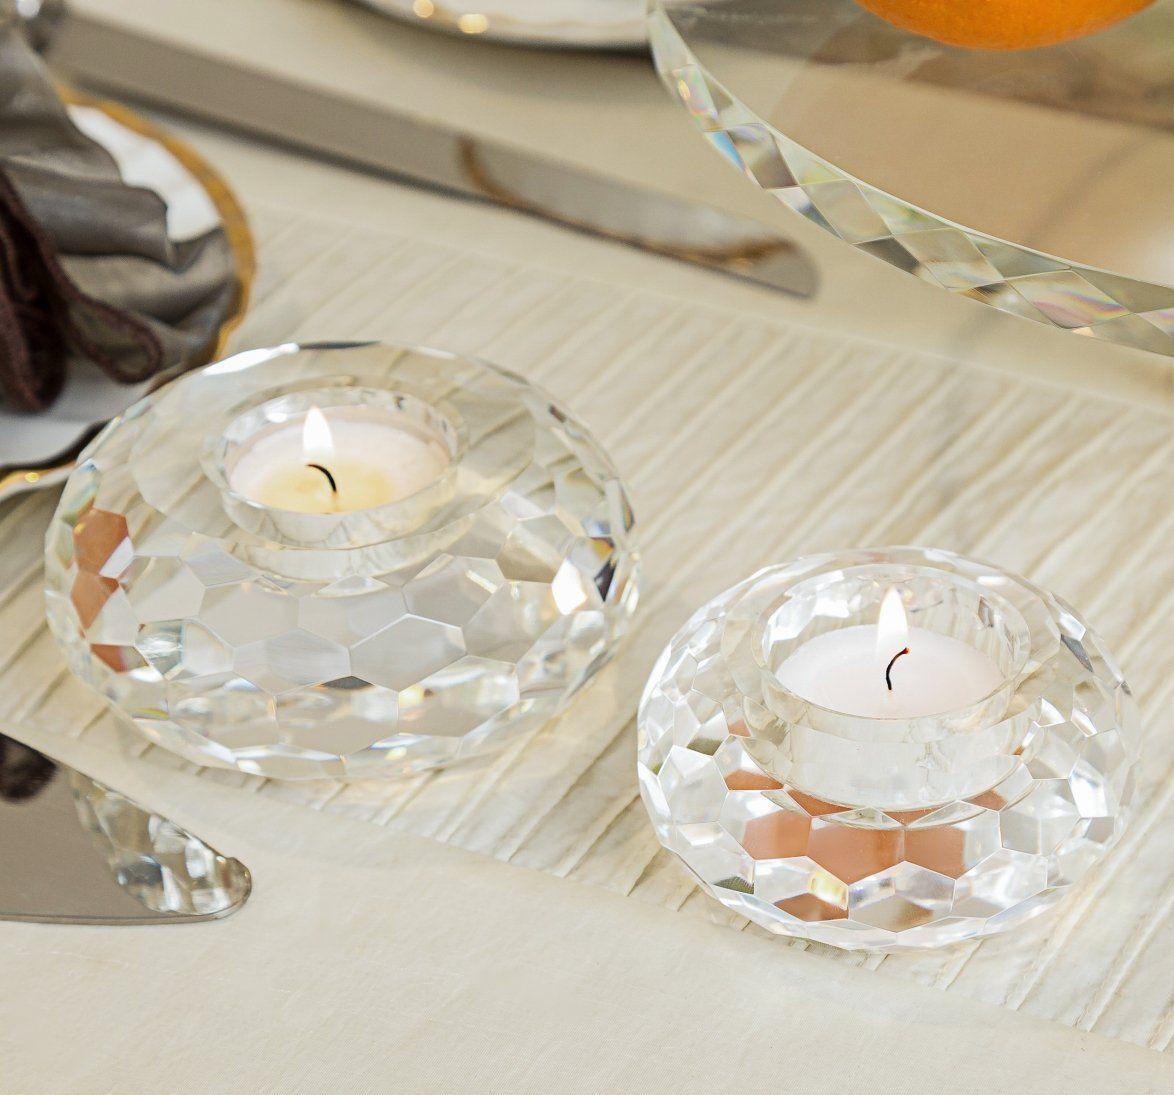 Donoucls Crystal Tealight Holders Candlesticks Christmas